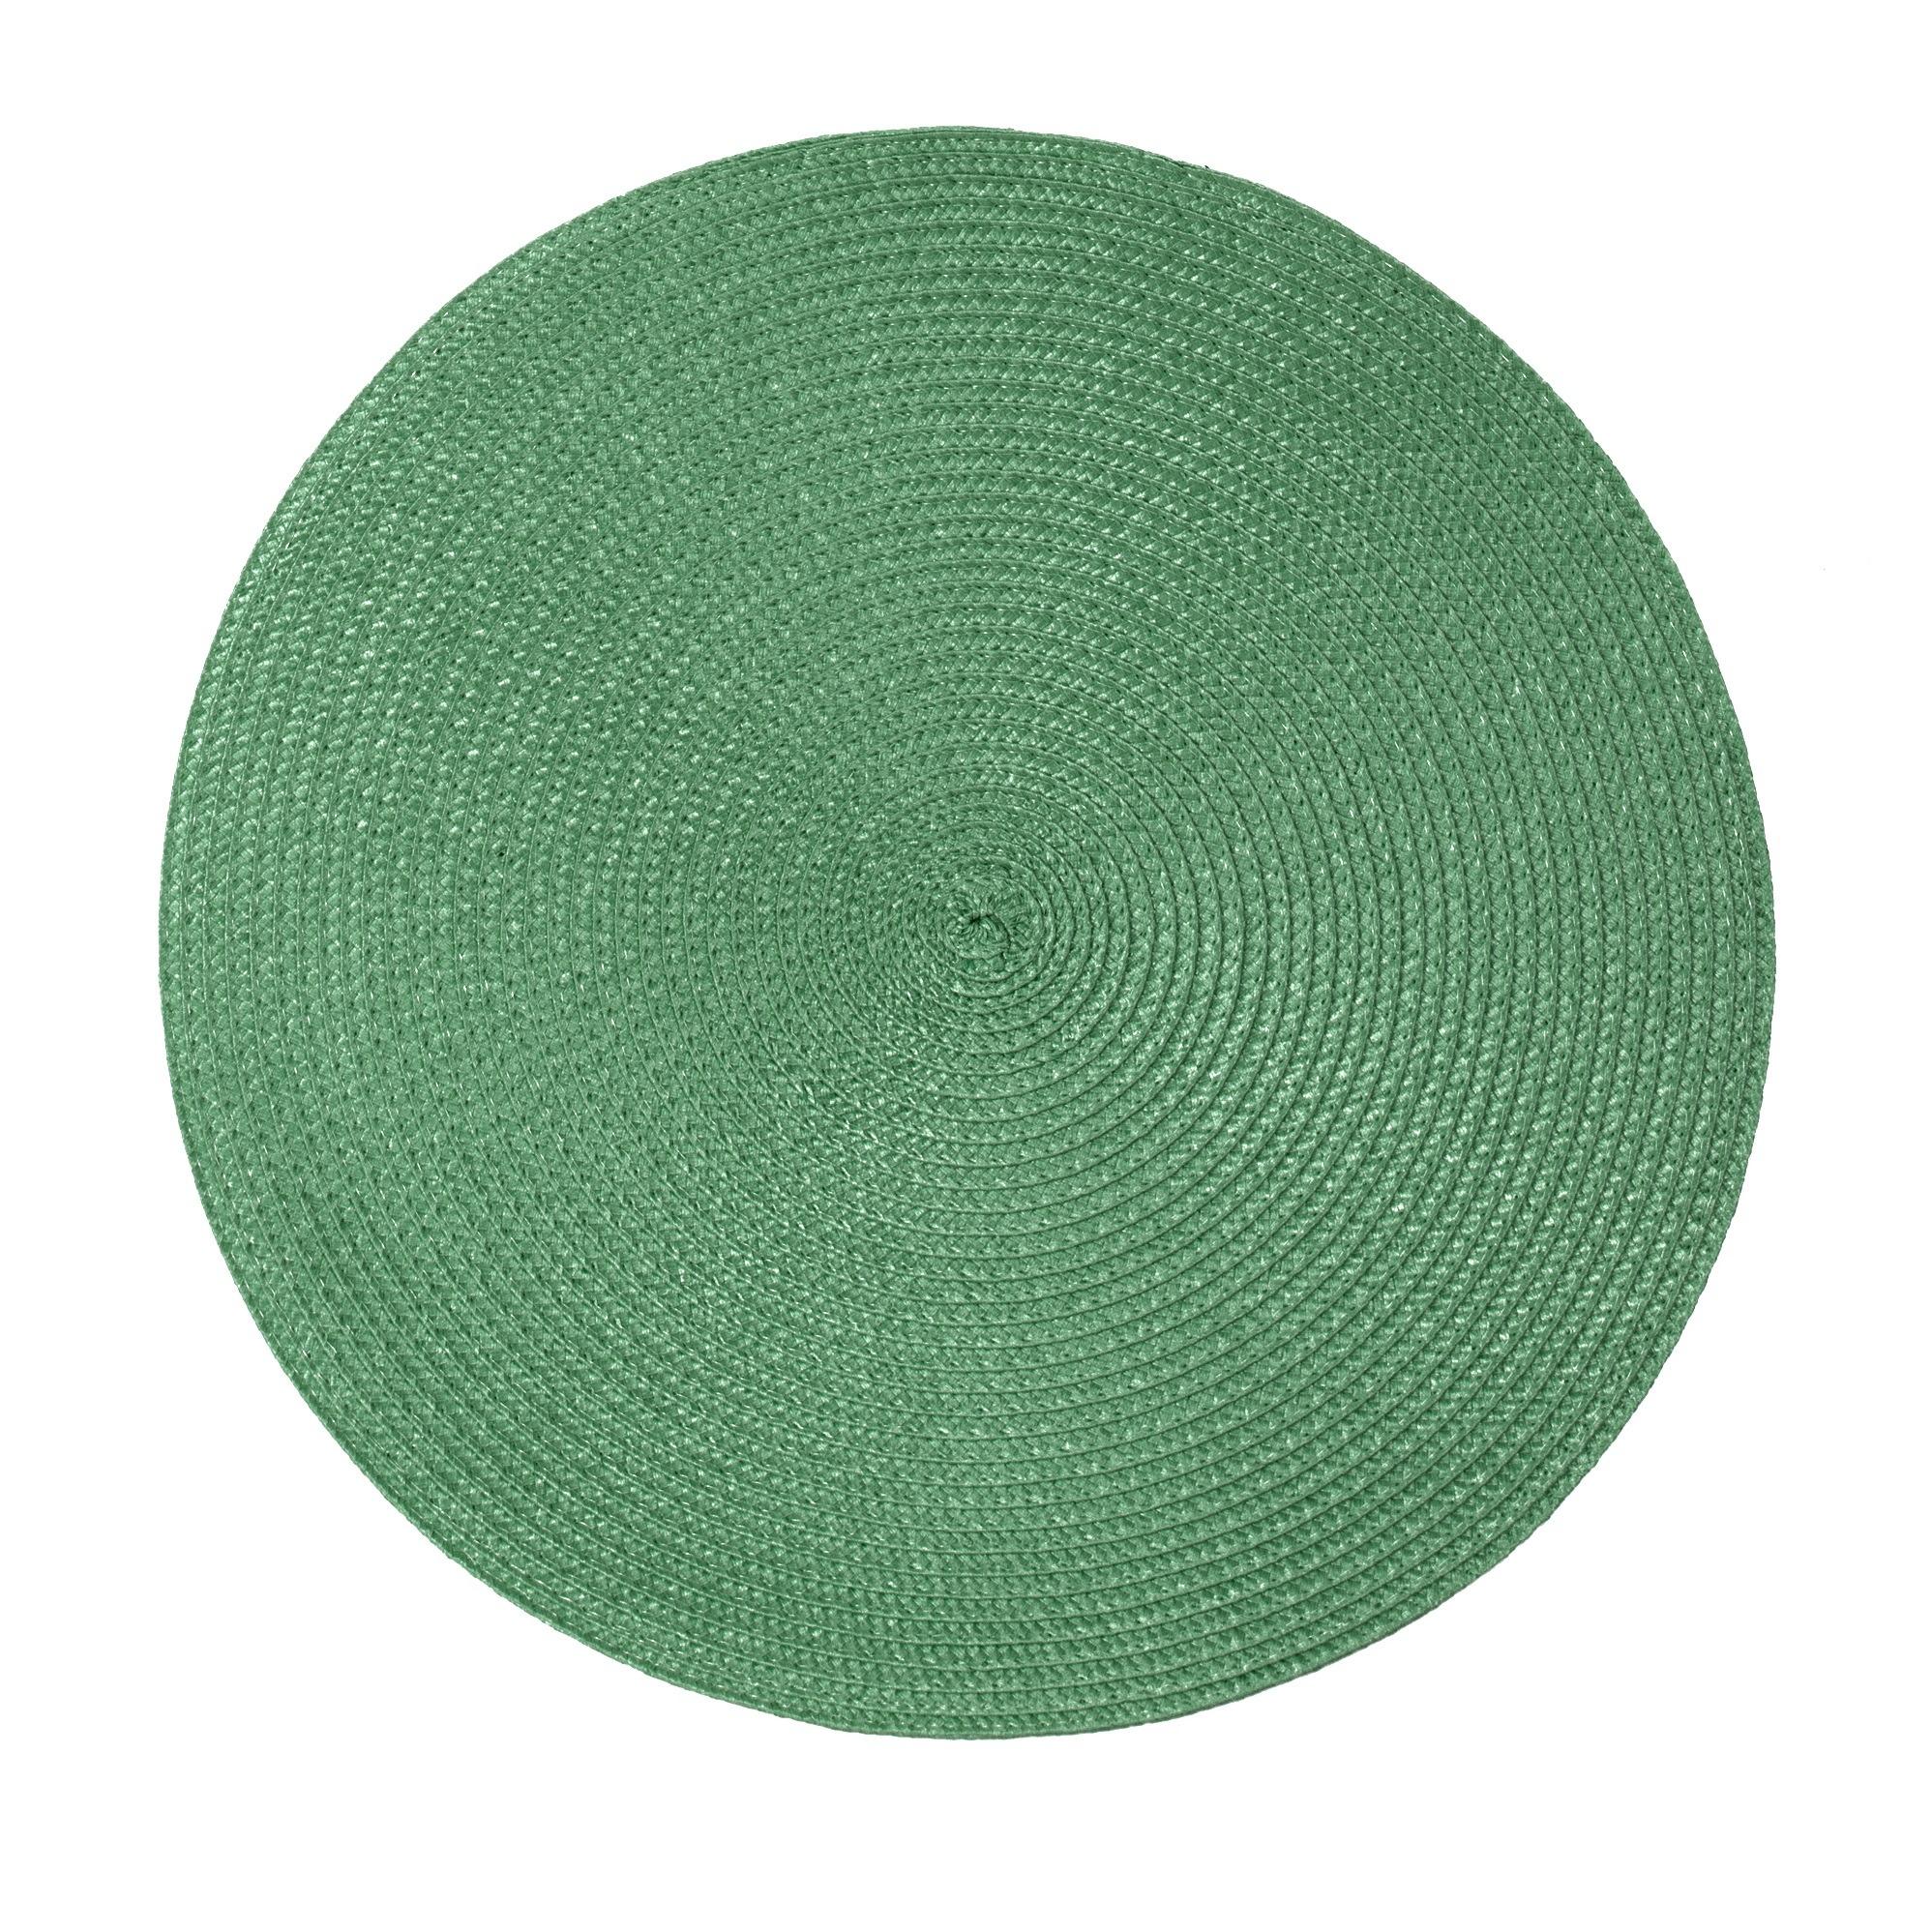 Pano Americano Redondo Verde 38 cm 1 Peca Fio de Poliester - Bianchini